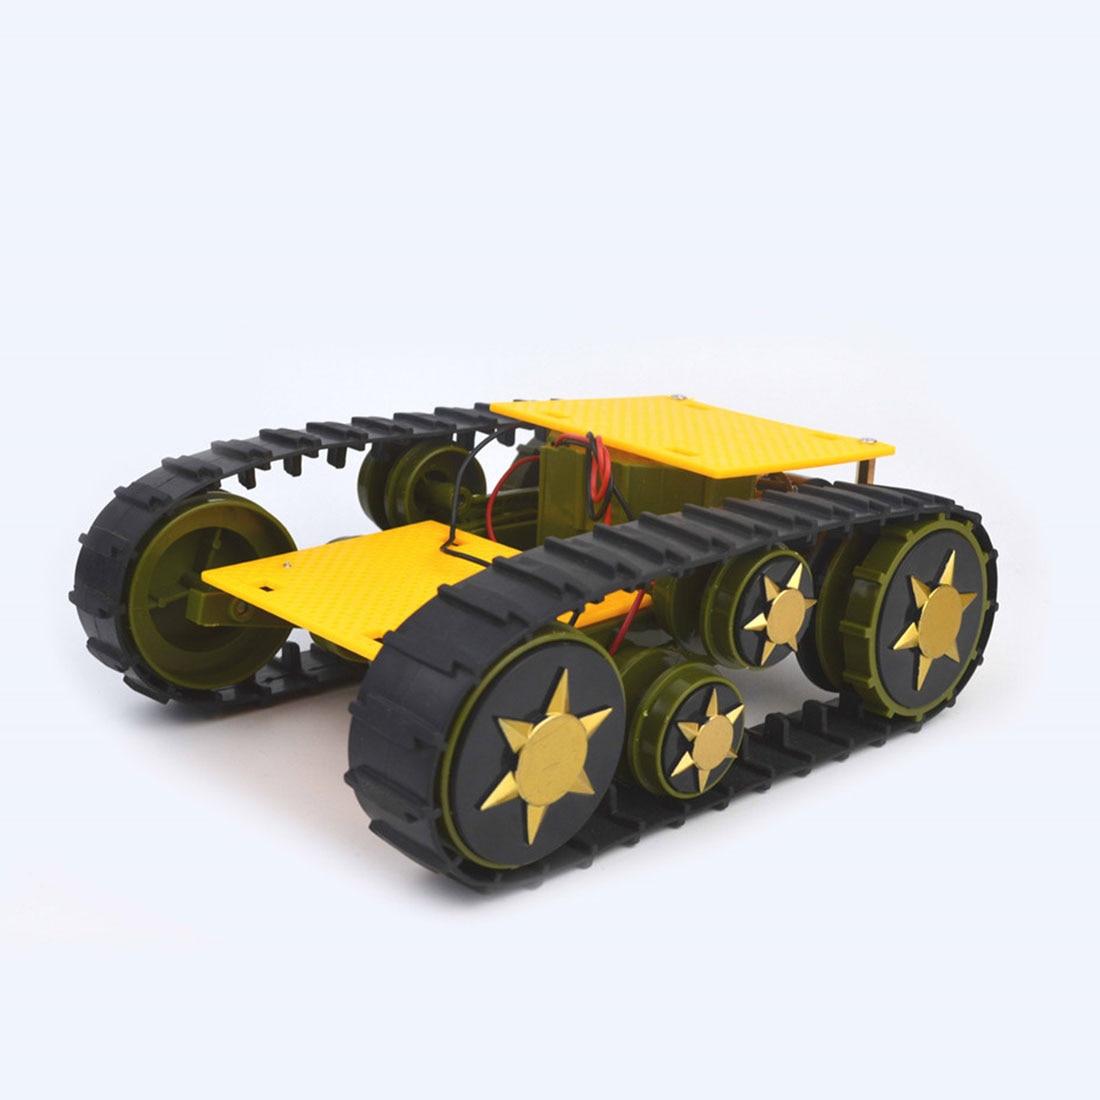 1pcs DIY Deformation Smart Tank Robot Crawler Caterpillar Vehicle Platform For Arduino SN1900 Kids Birthdaty Gifts Drop Shipping